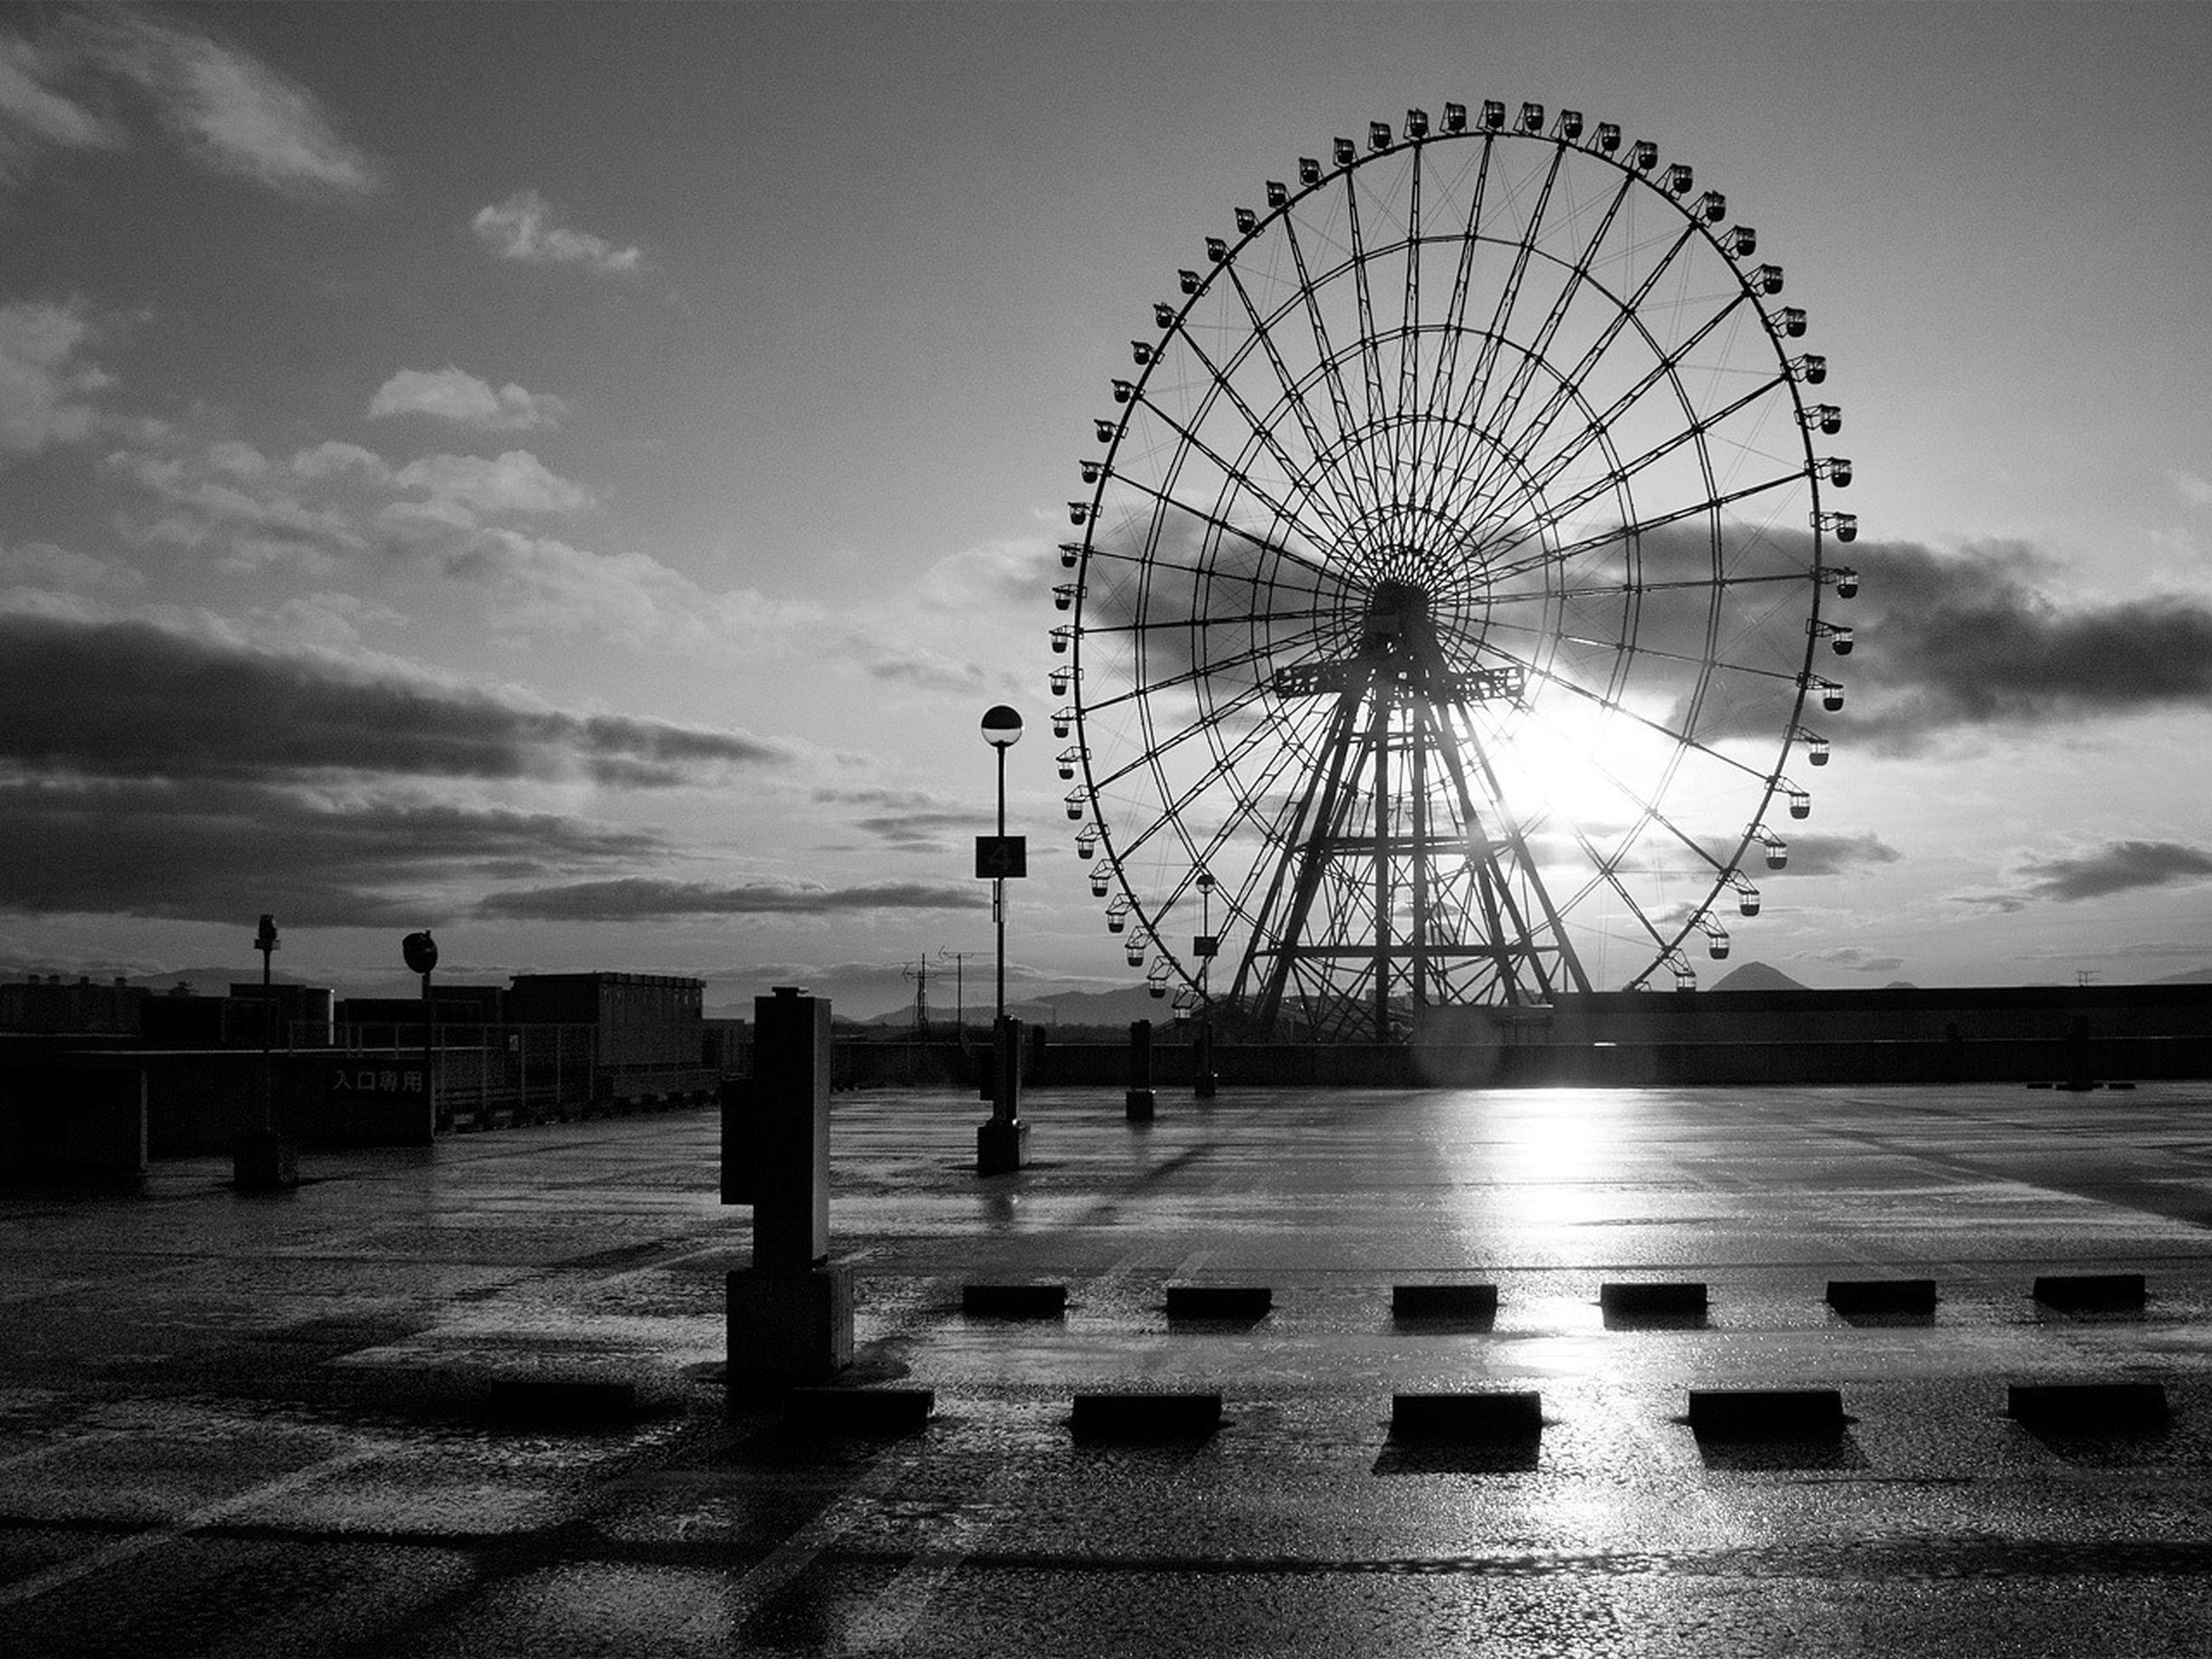 ferris wheel, amusement park ride, sky, amusement park, arts culture and entertainment, water, cloud - sky, silhouette, low angle view, built structure, sea, incidental people, sunset, outdoors, circle, cloud, day, architecture, sunlight, nature